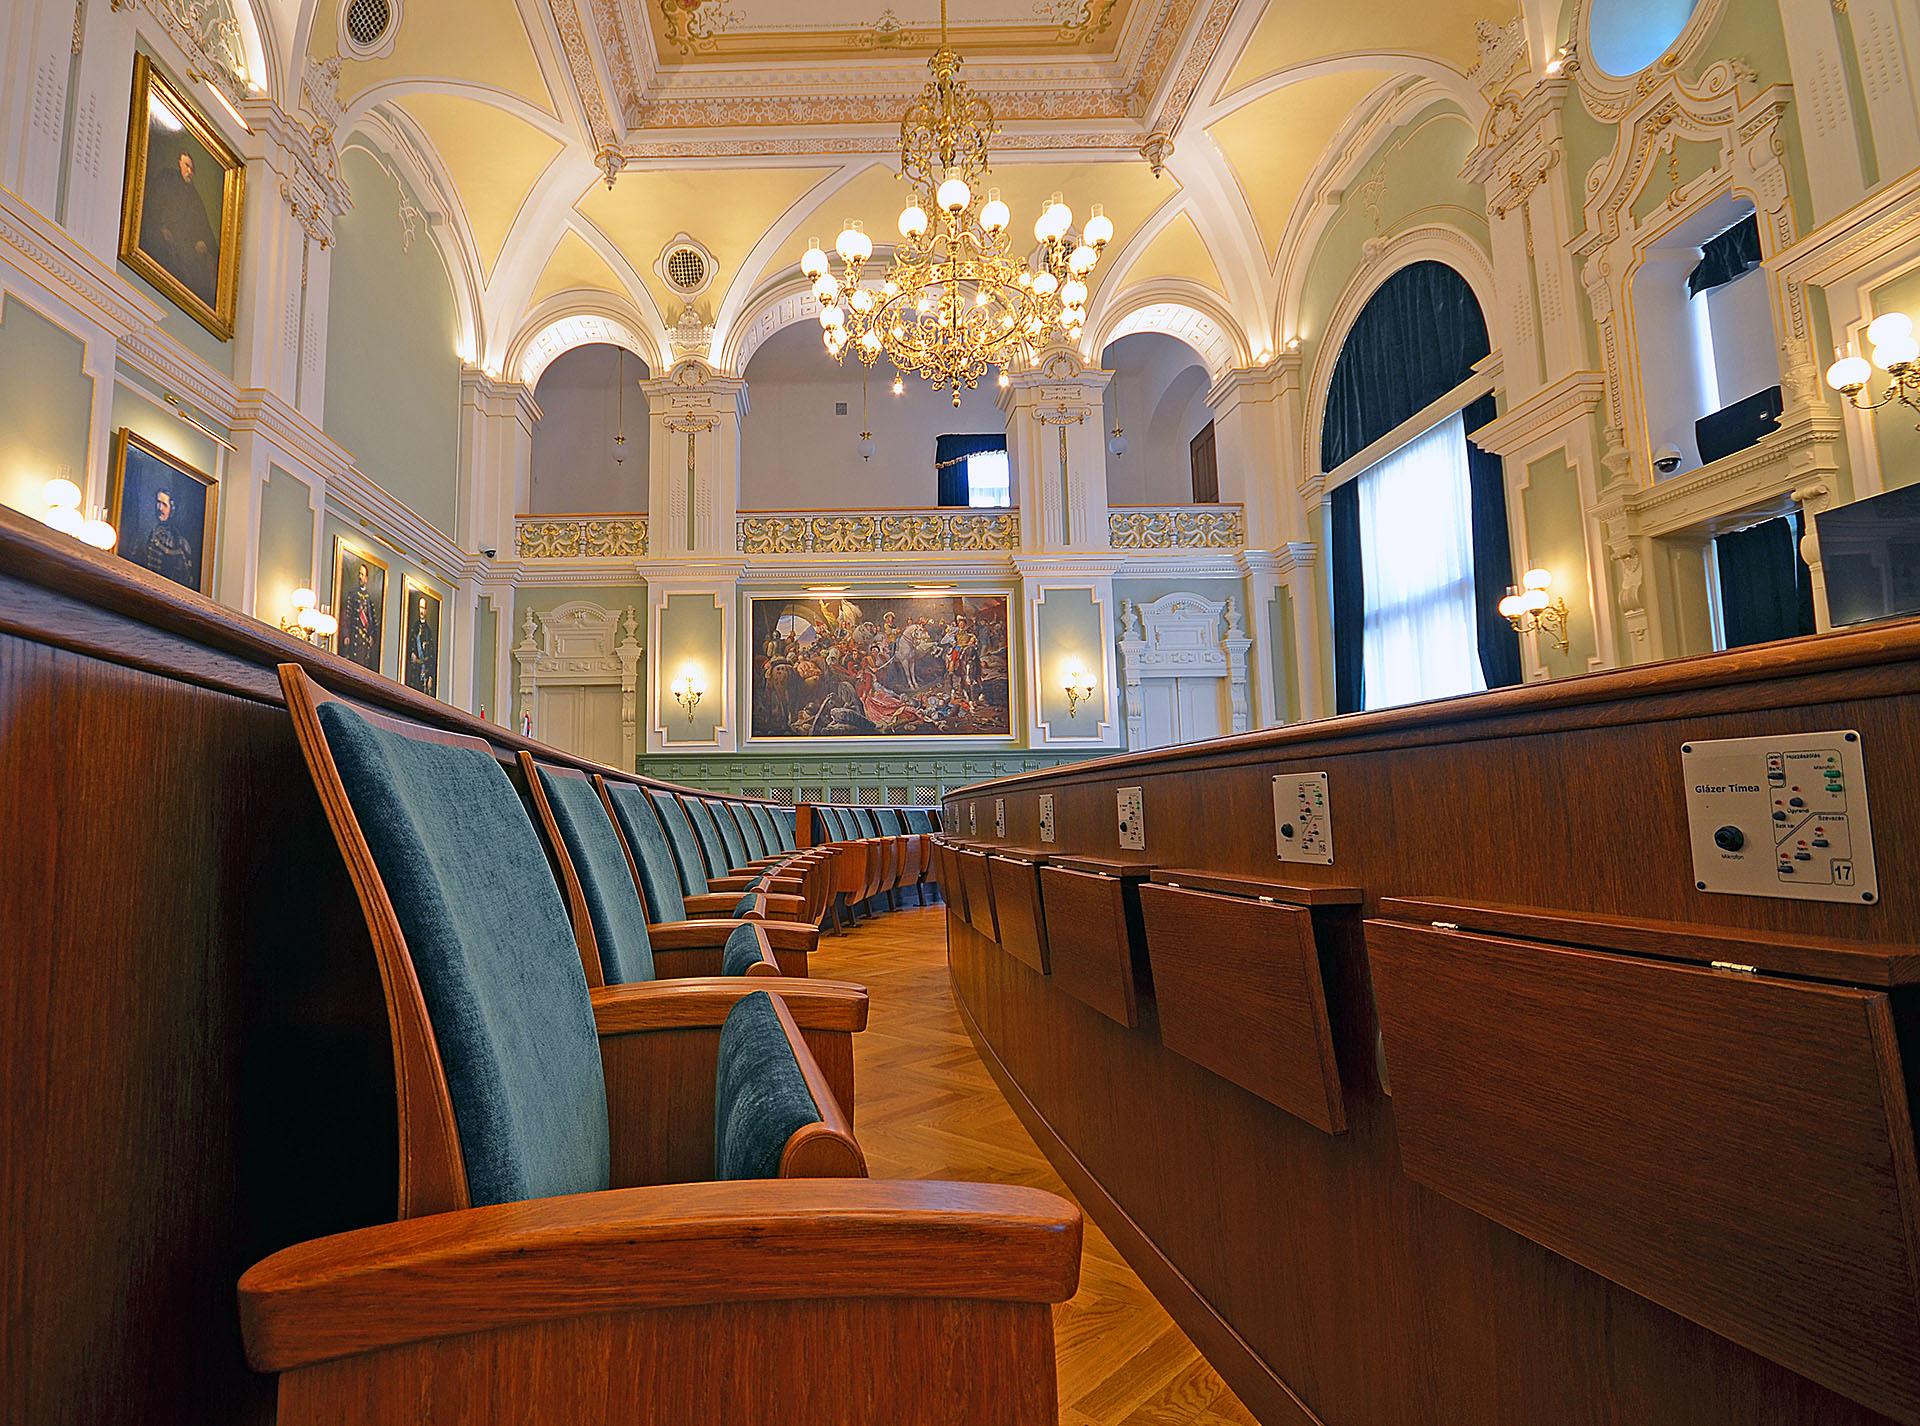 HU Györ Rathaus Festsaal 4 web